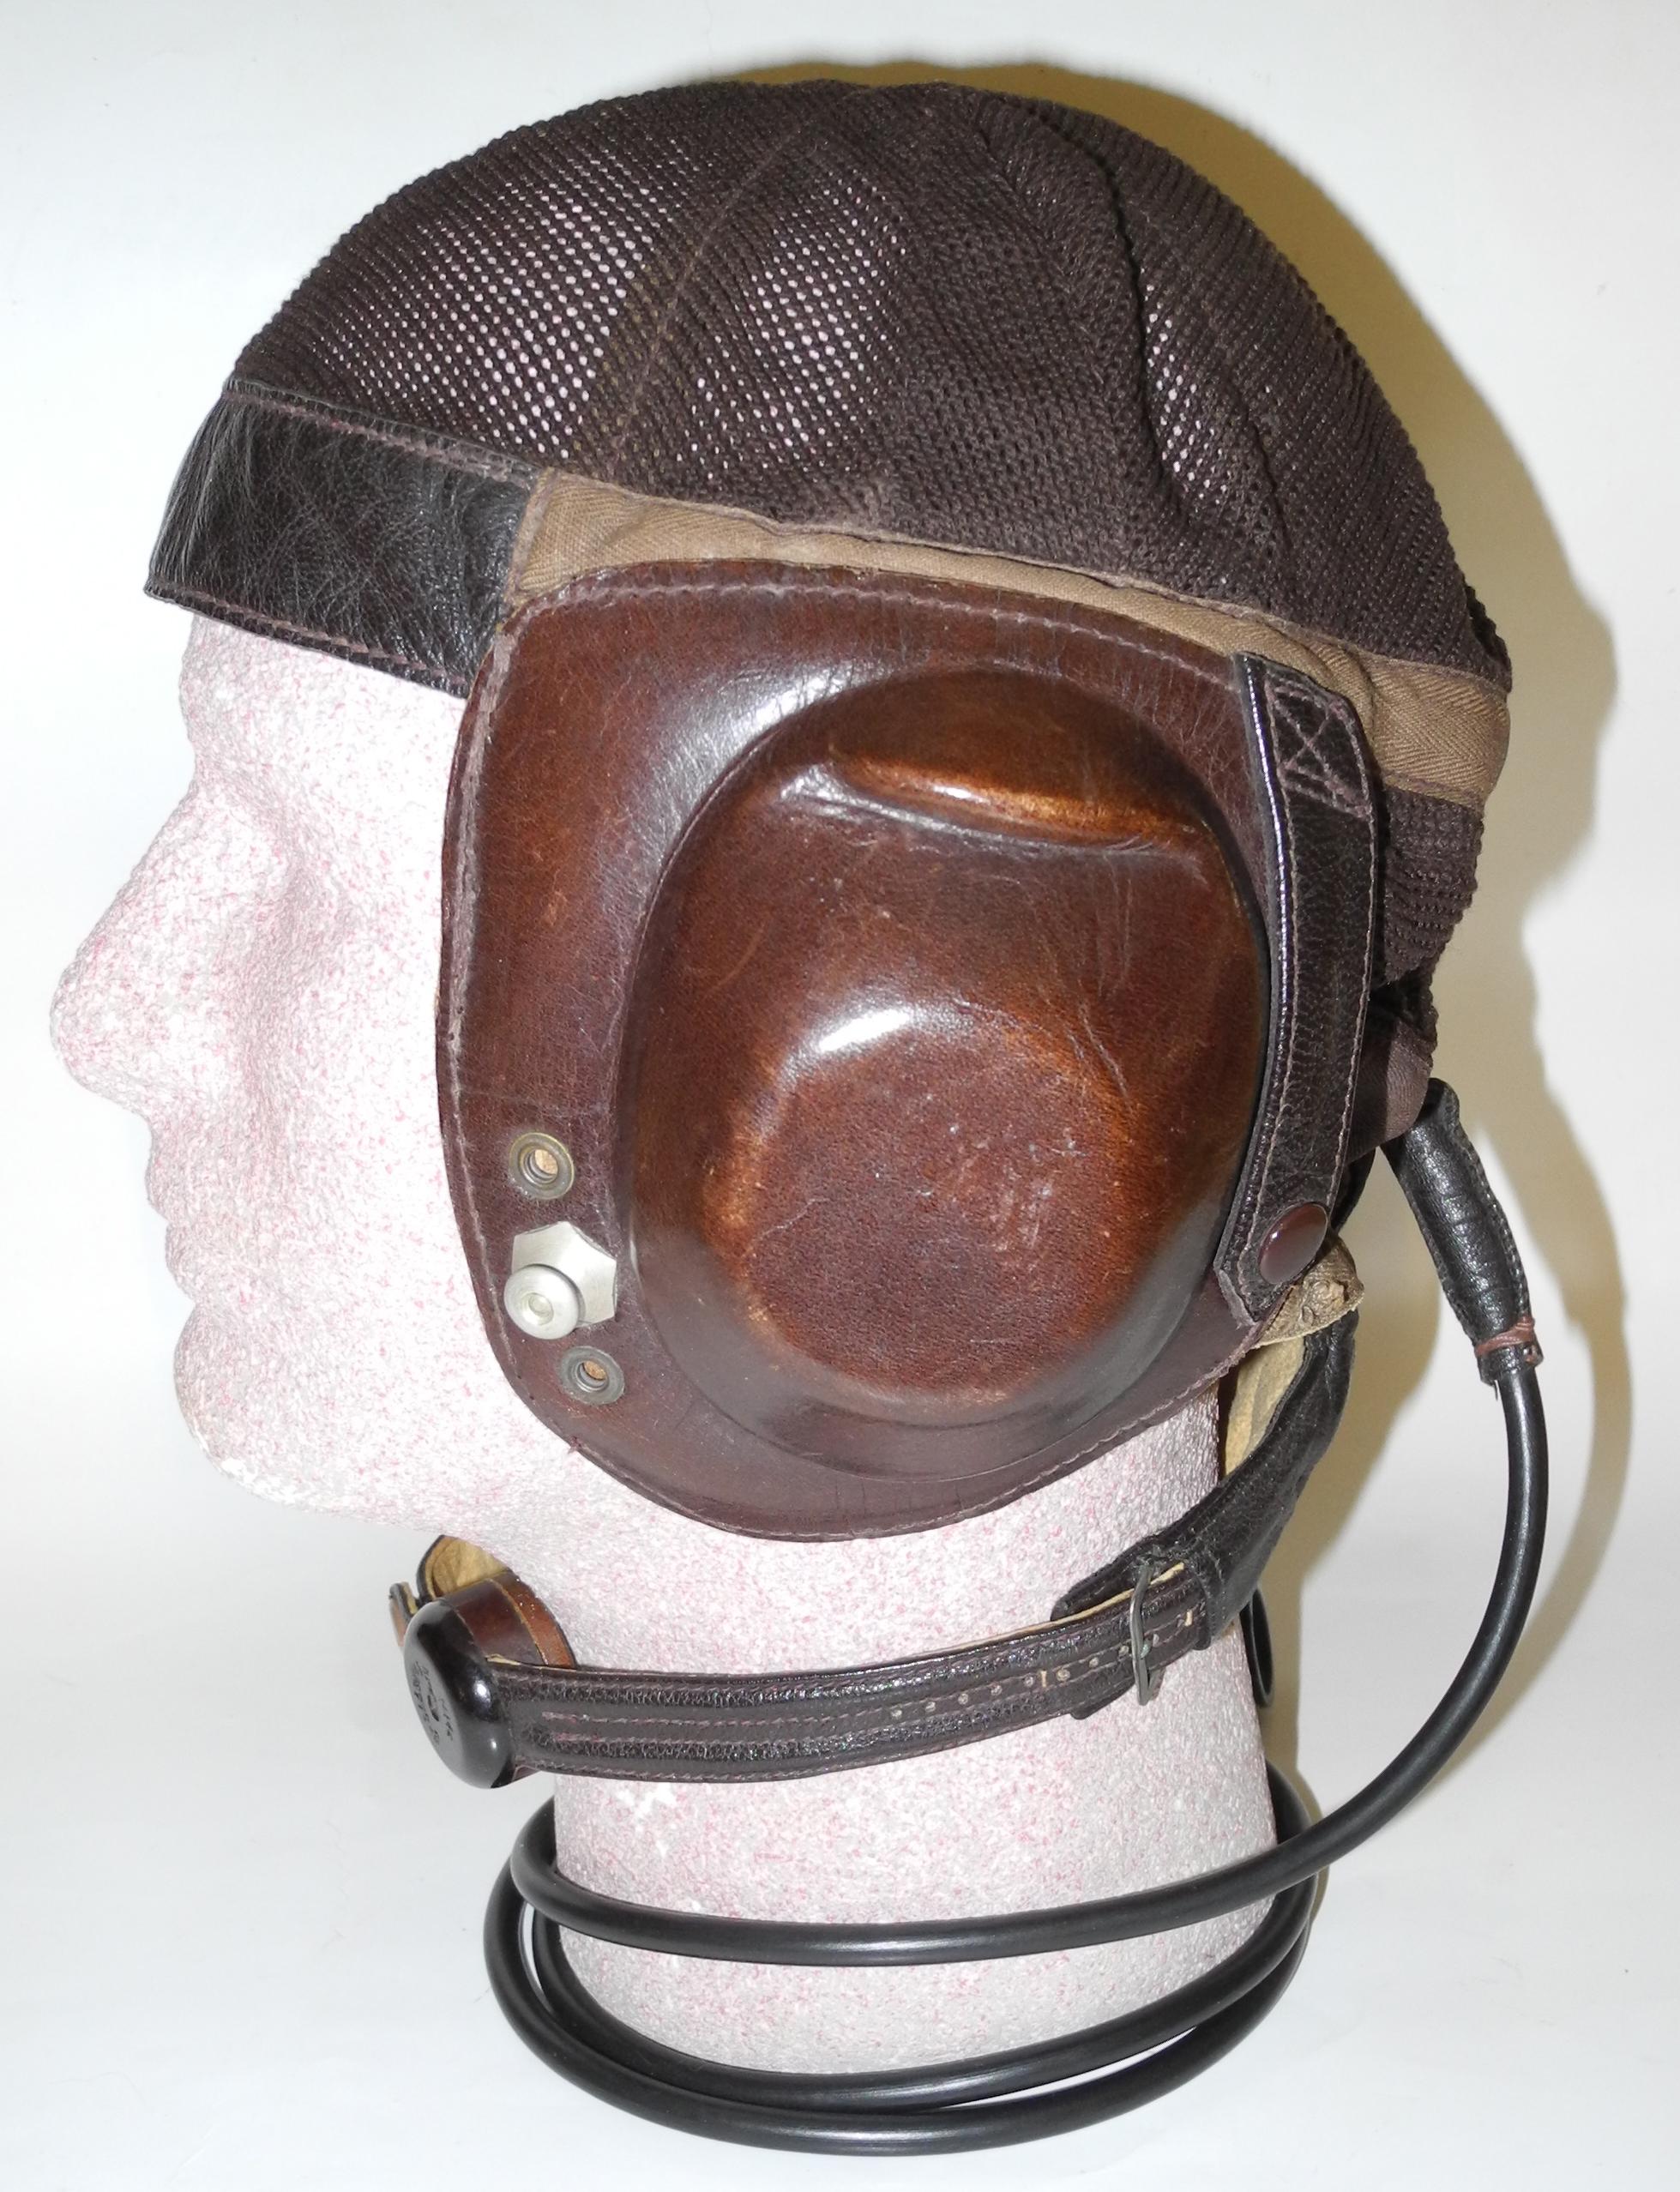 LW LKpN101 helmet